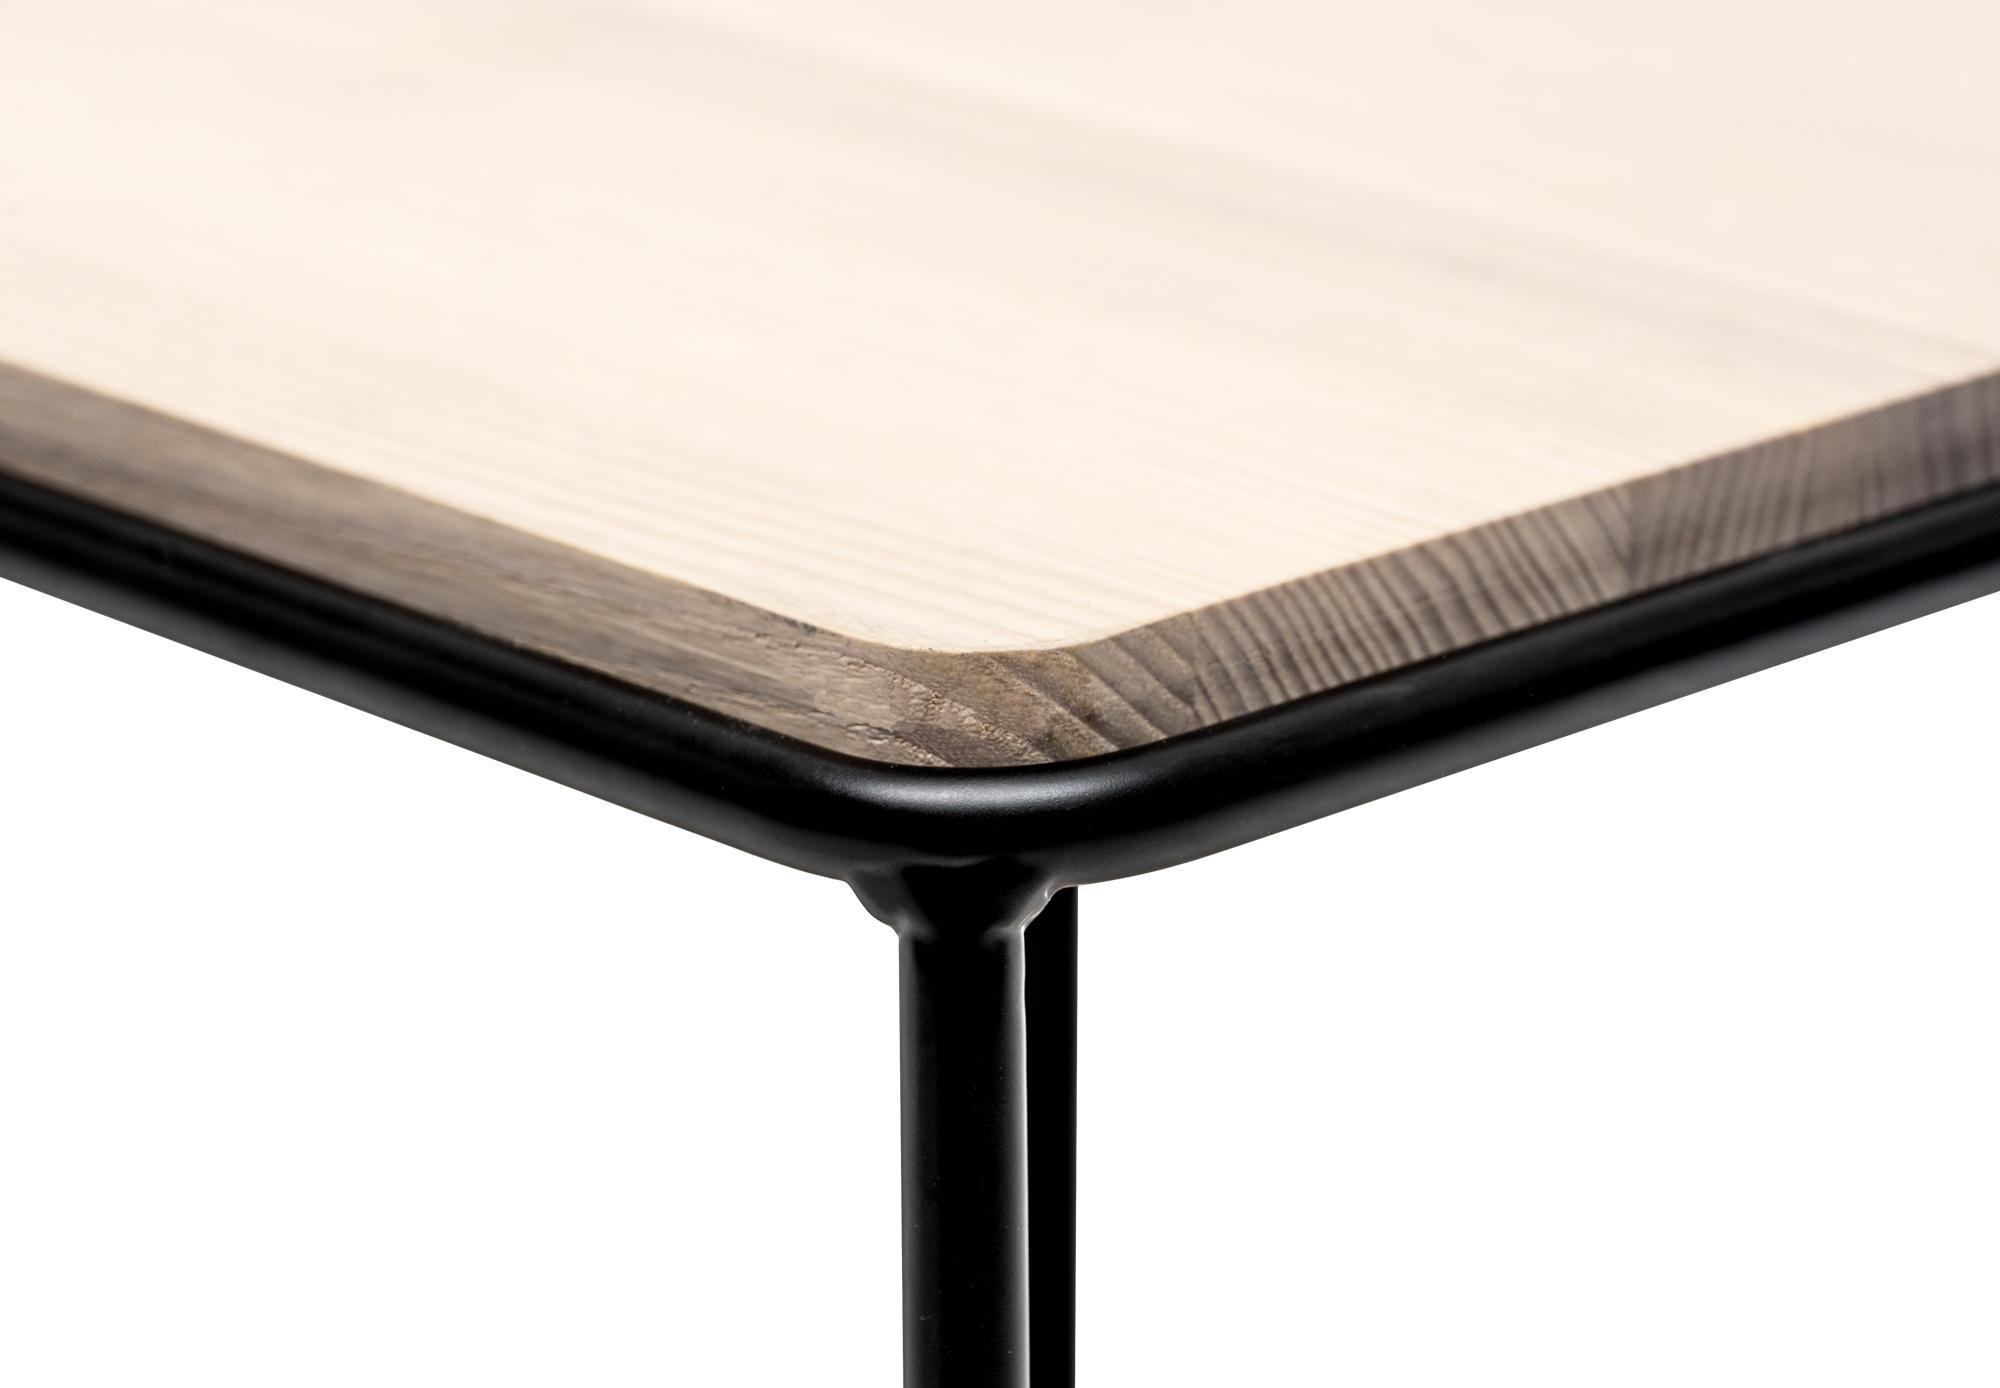 yilmaz tables basses de objekte unserer tage architonic. Black Bedroom Furniture Sets. Home Design Ideas